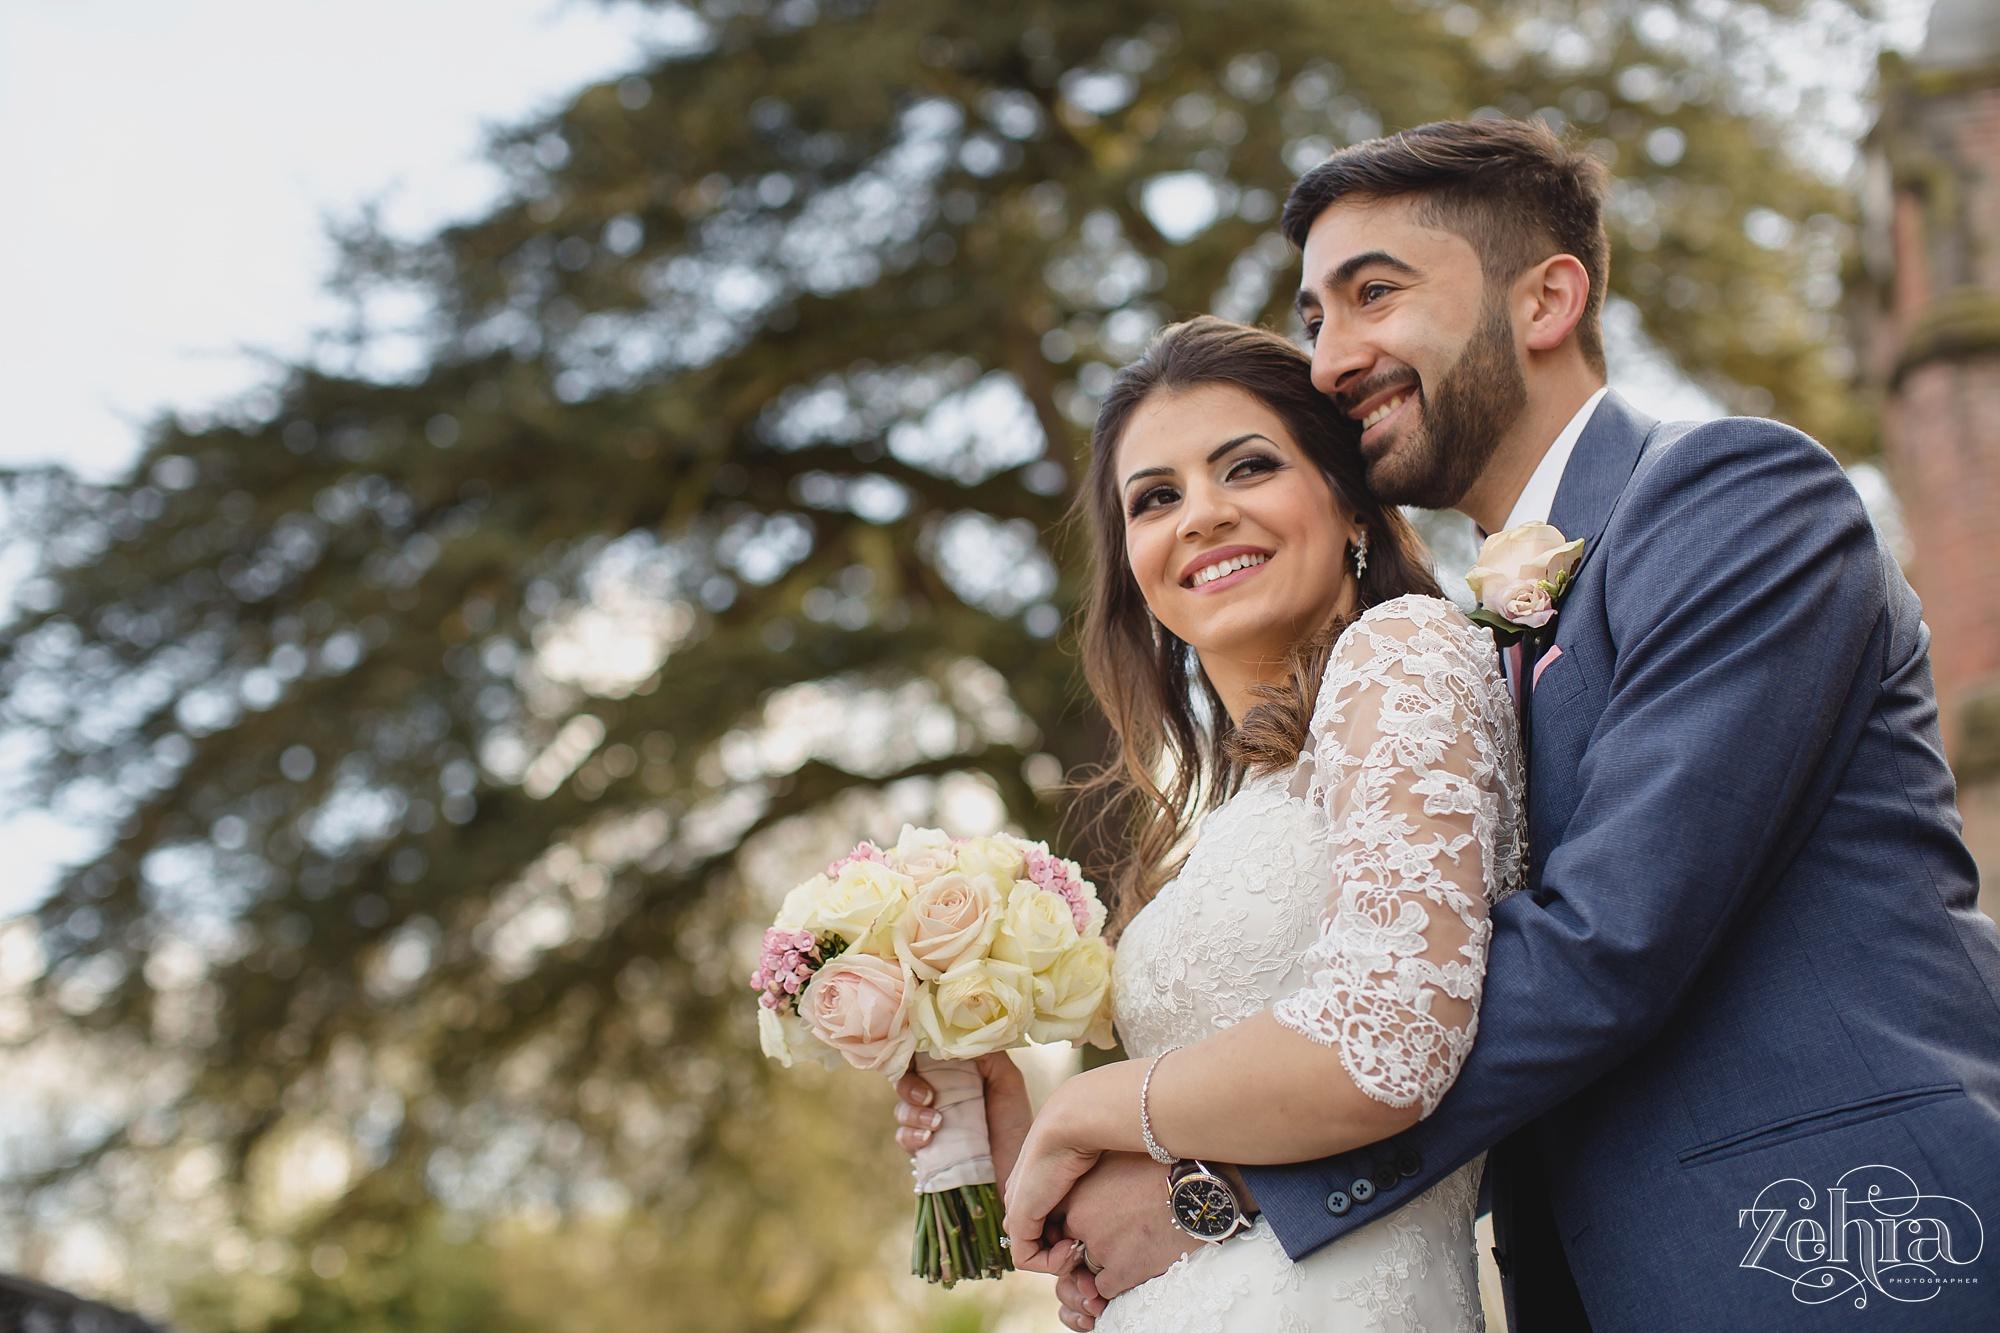 zehra photographer mere cheshire wedding_0020.jpg